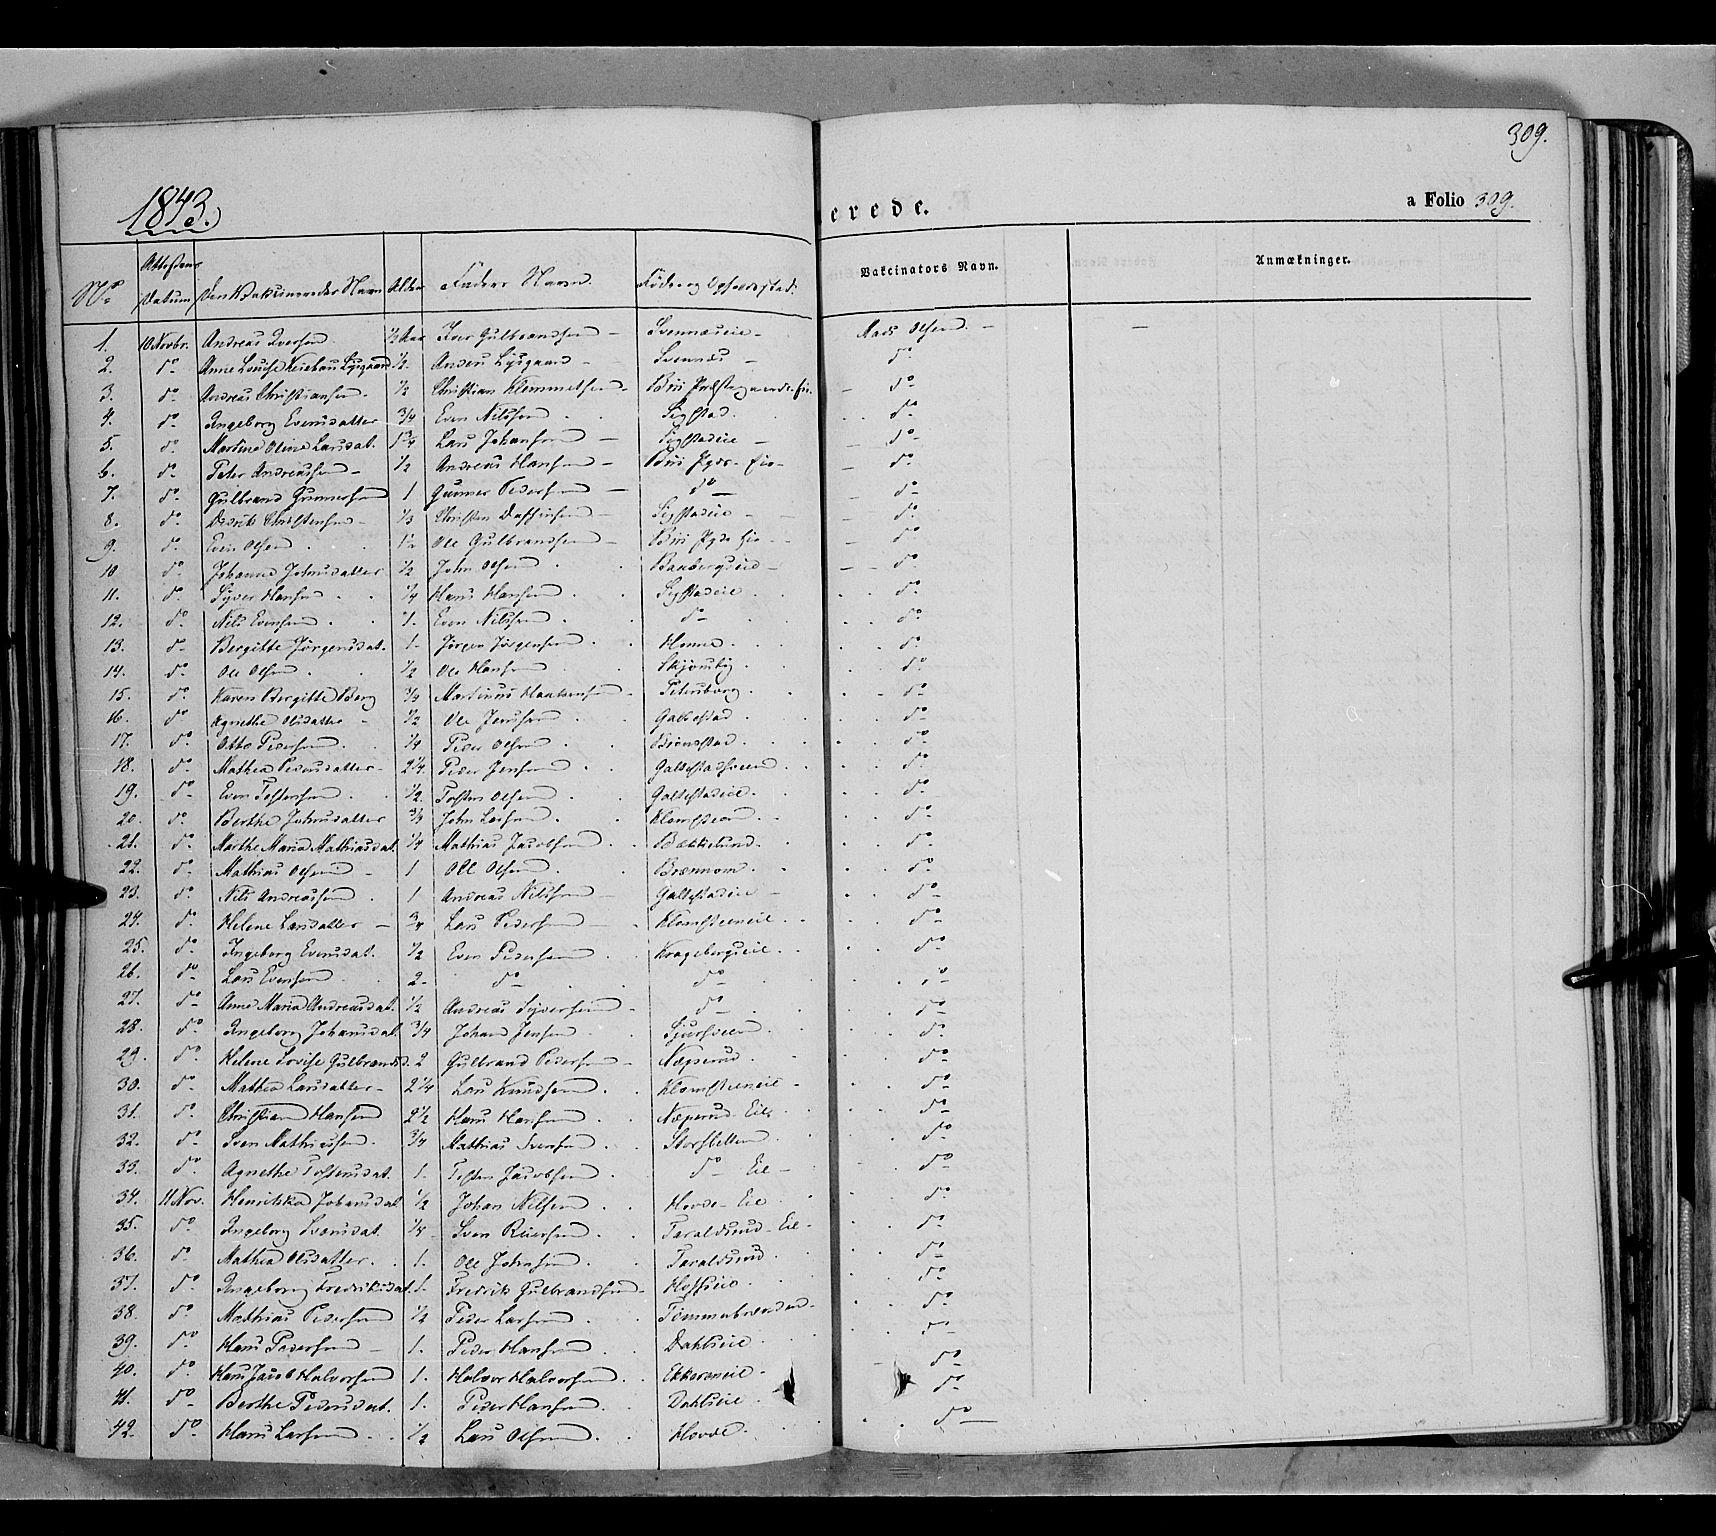 SAH, Biri prestekontor, Ministerialbok nr. 5, 1843-1854, s. 309